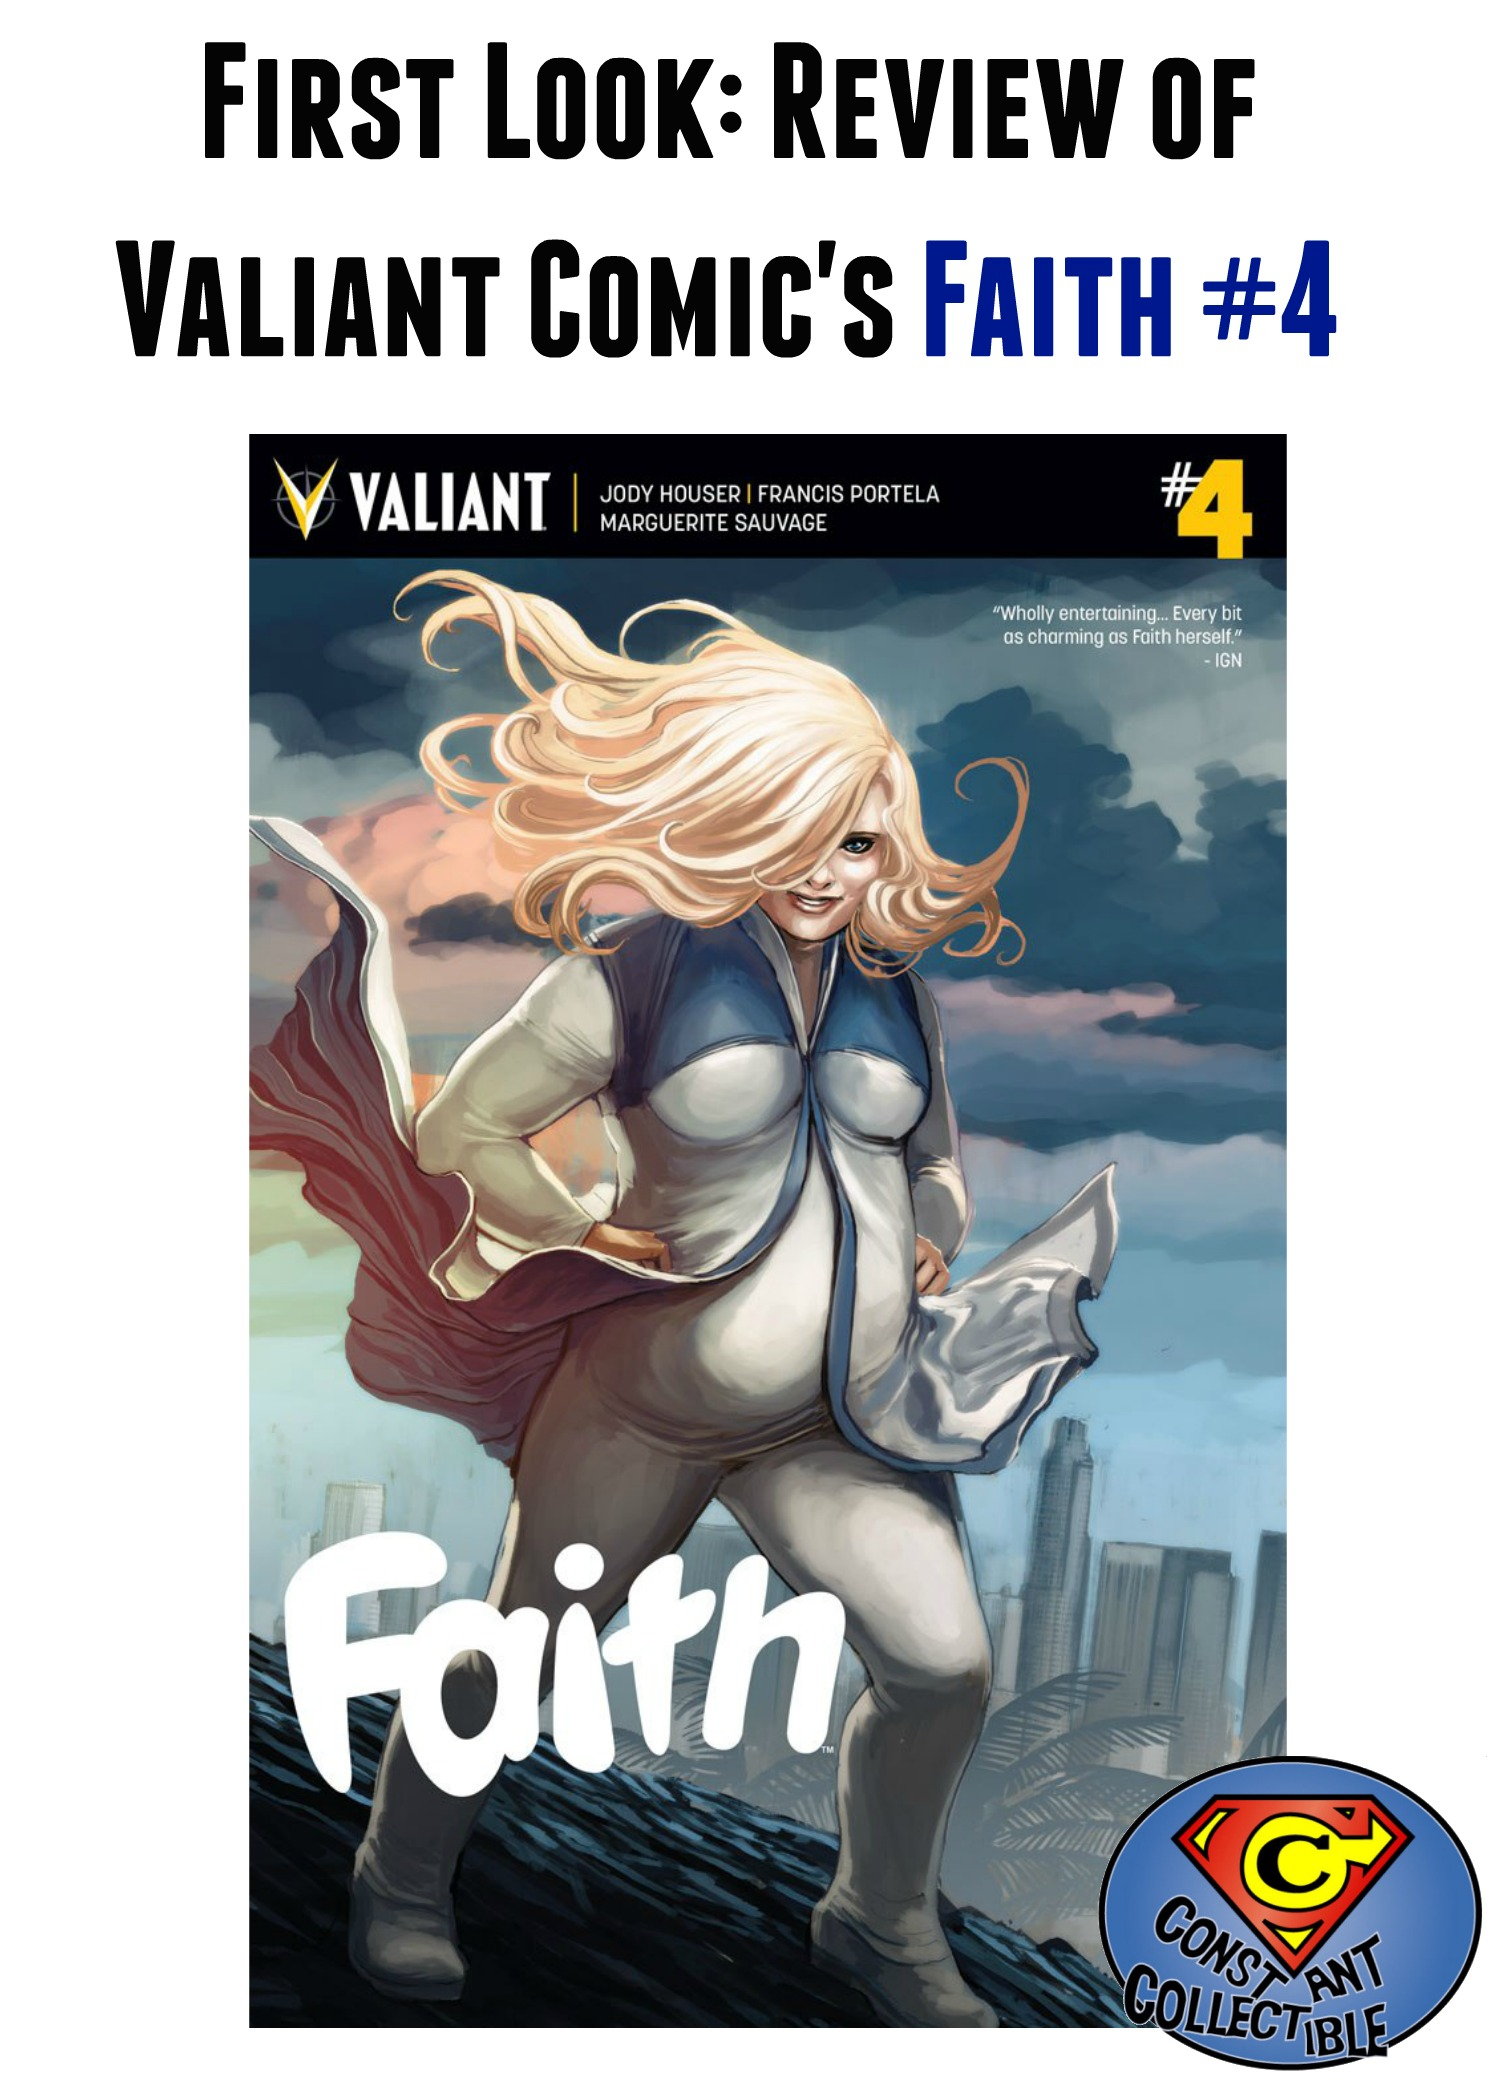 First Look Review of @ValiantComics Faith #4 by Jody Houser